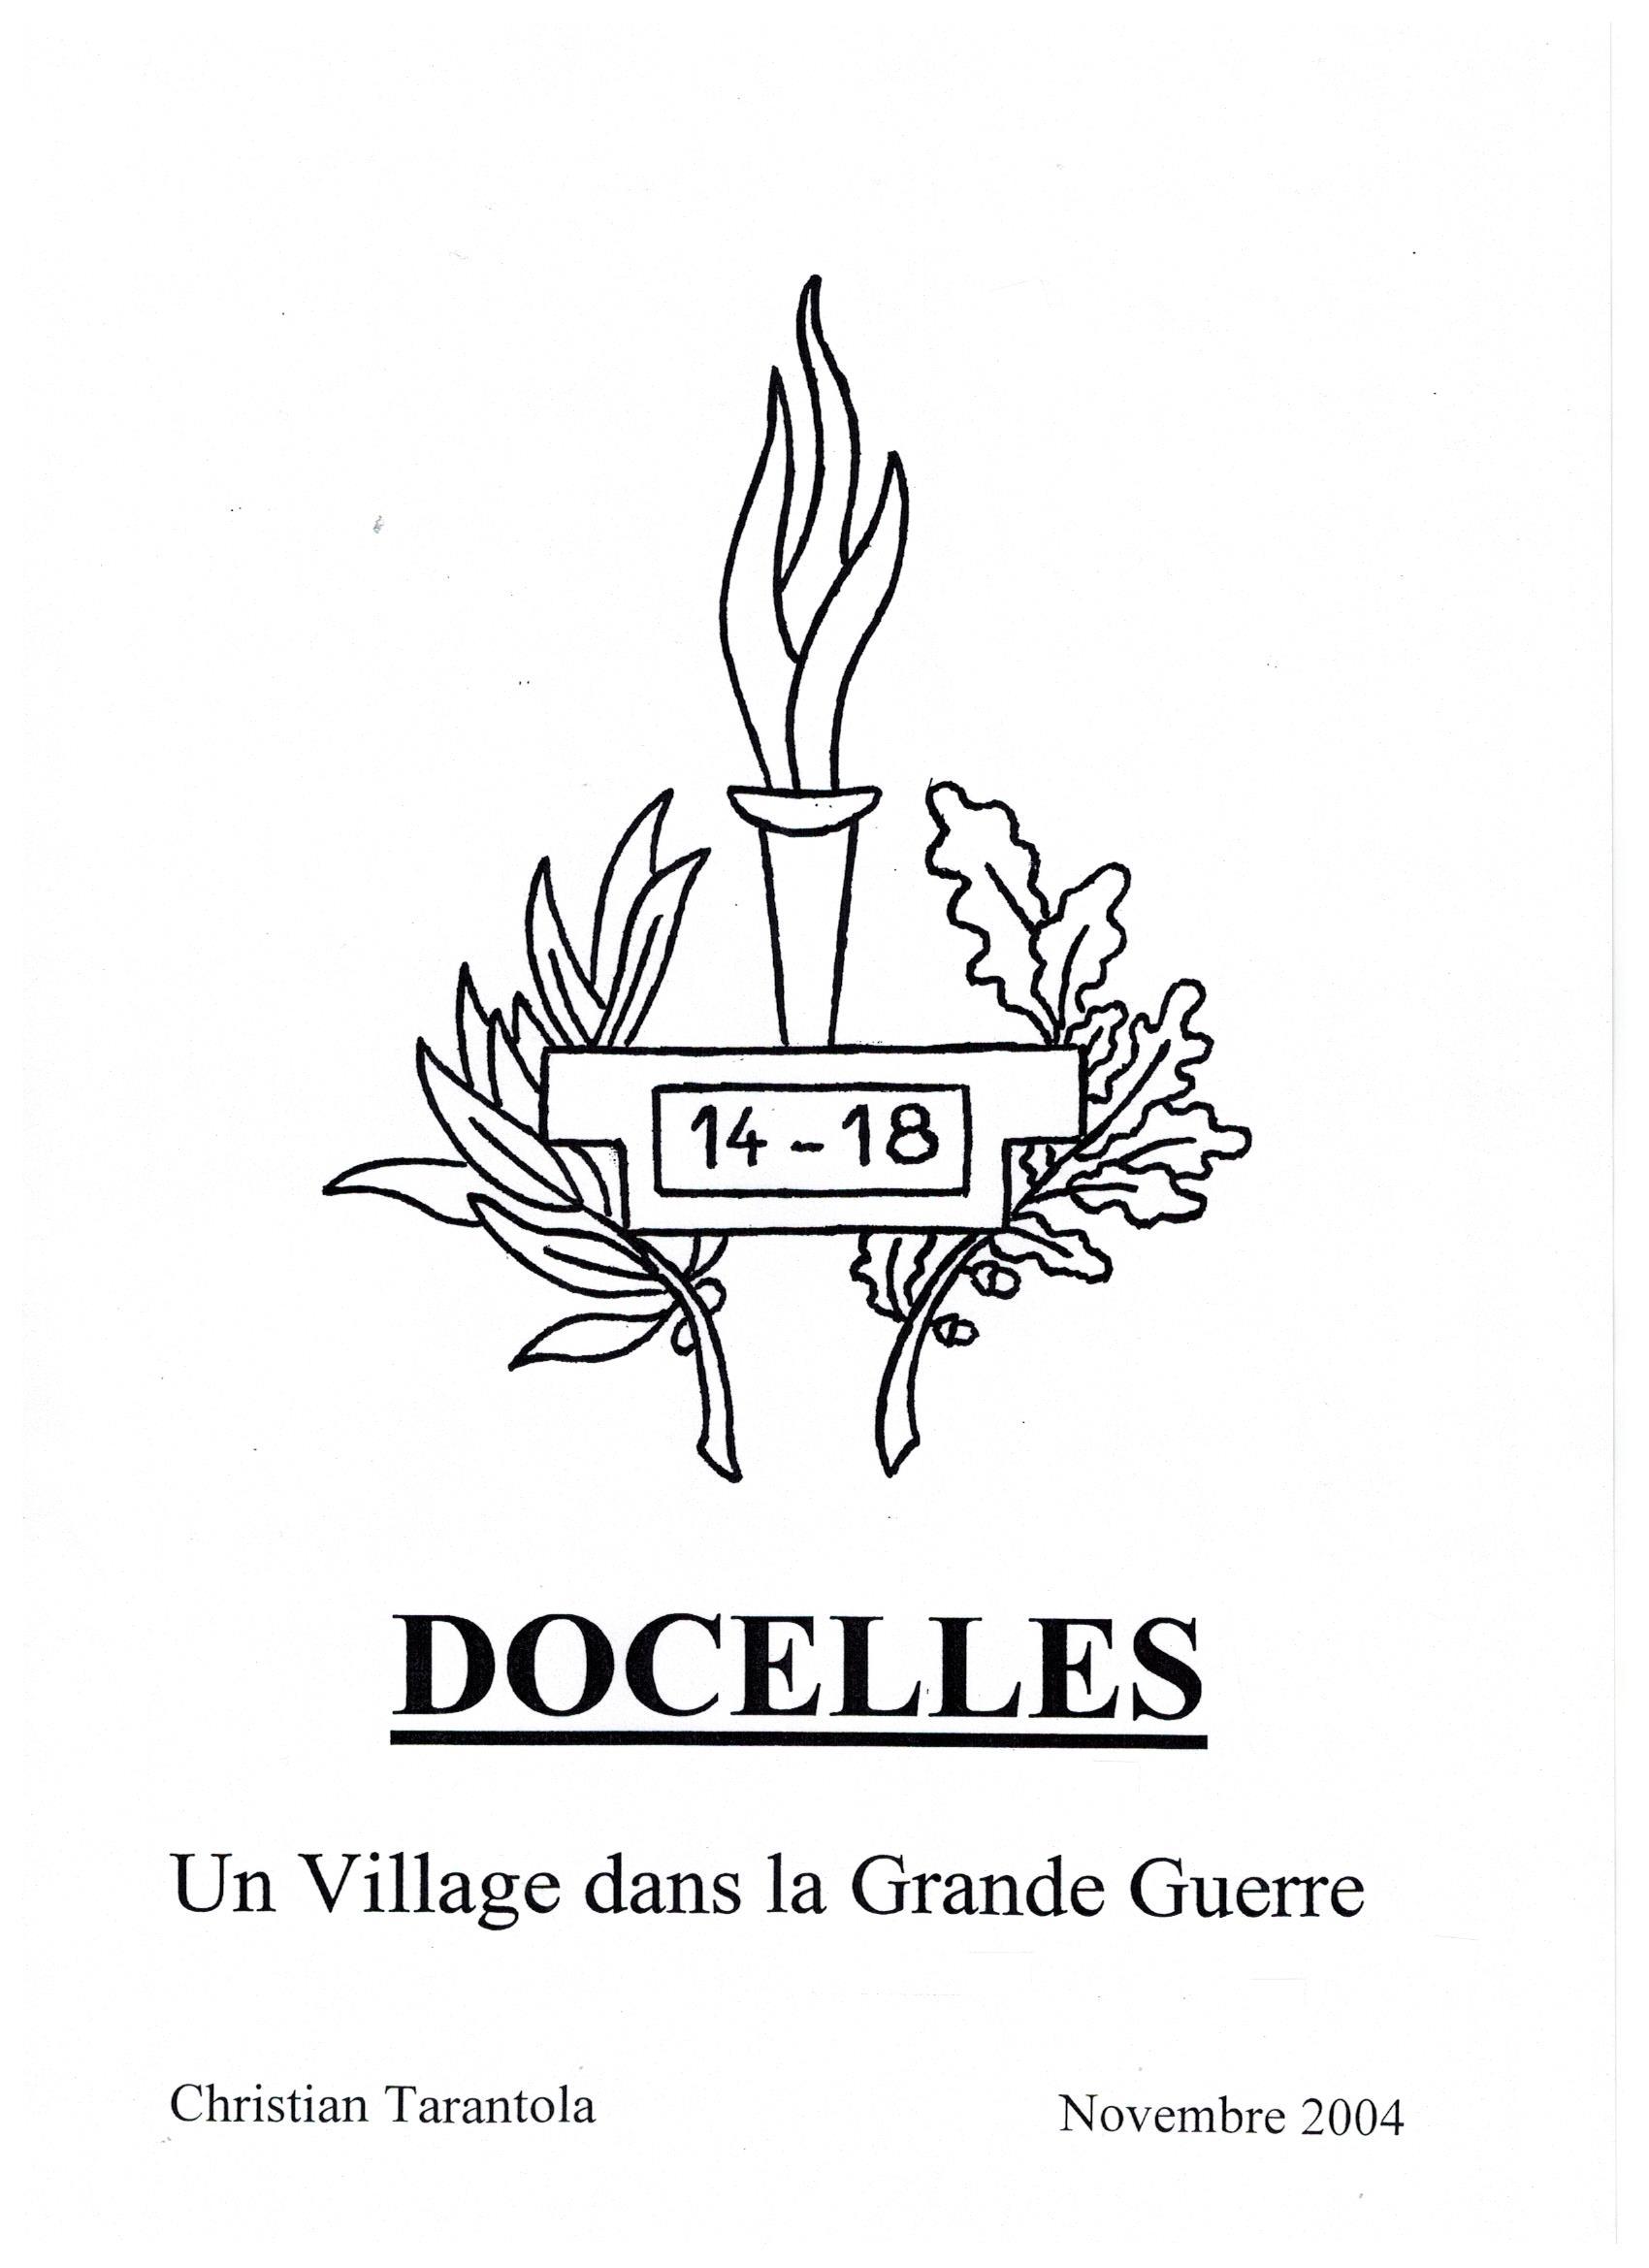 Docelles Image1 Couverture.jpg